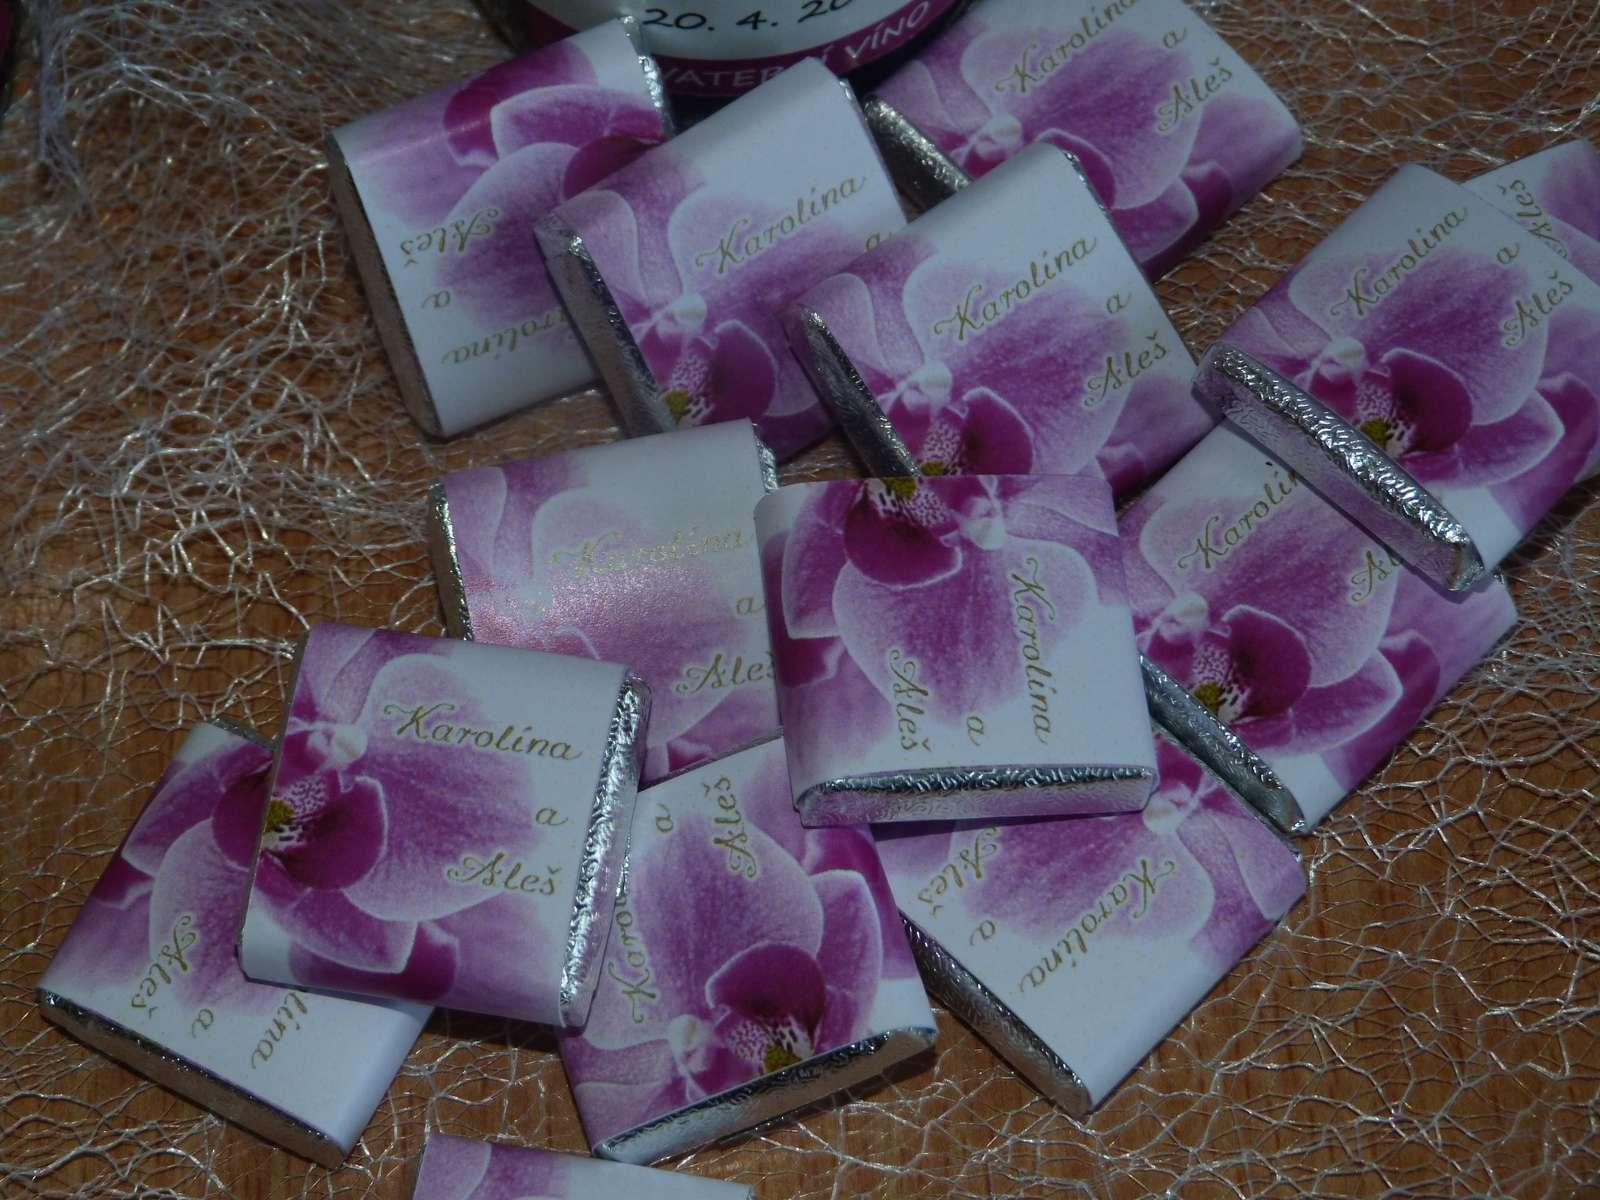 Čokoláda Barry Callebaut  - 3 gramáže - Obrázek č. 1